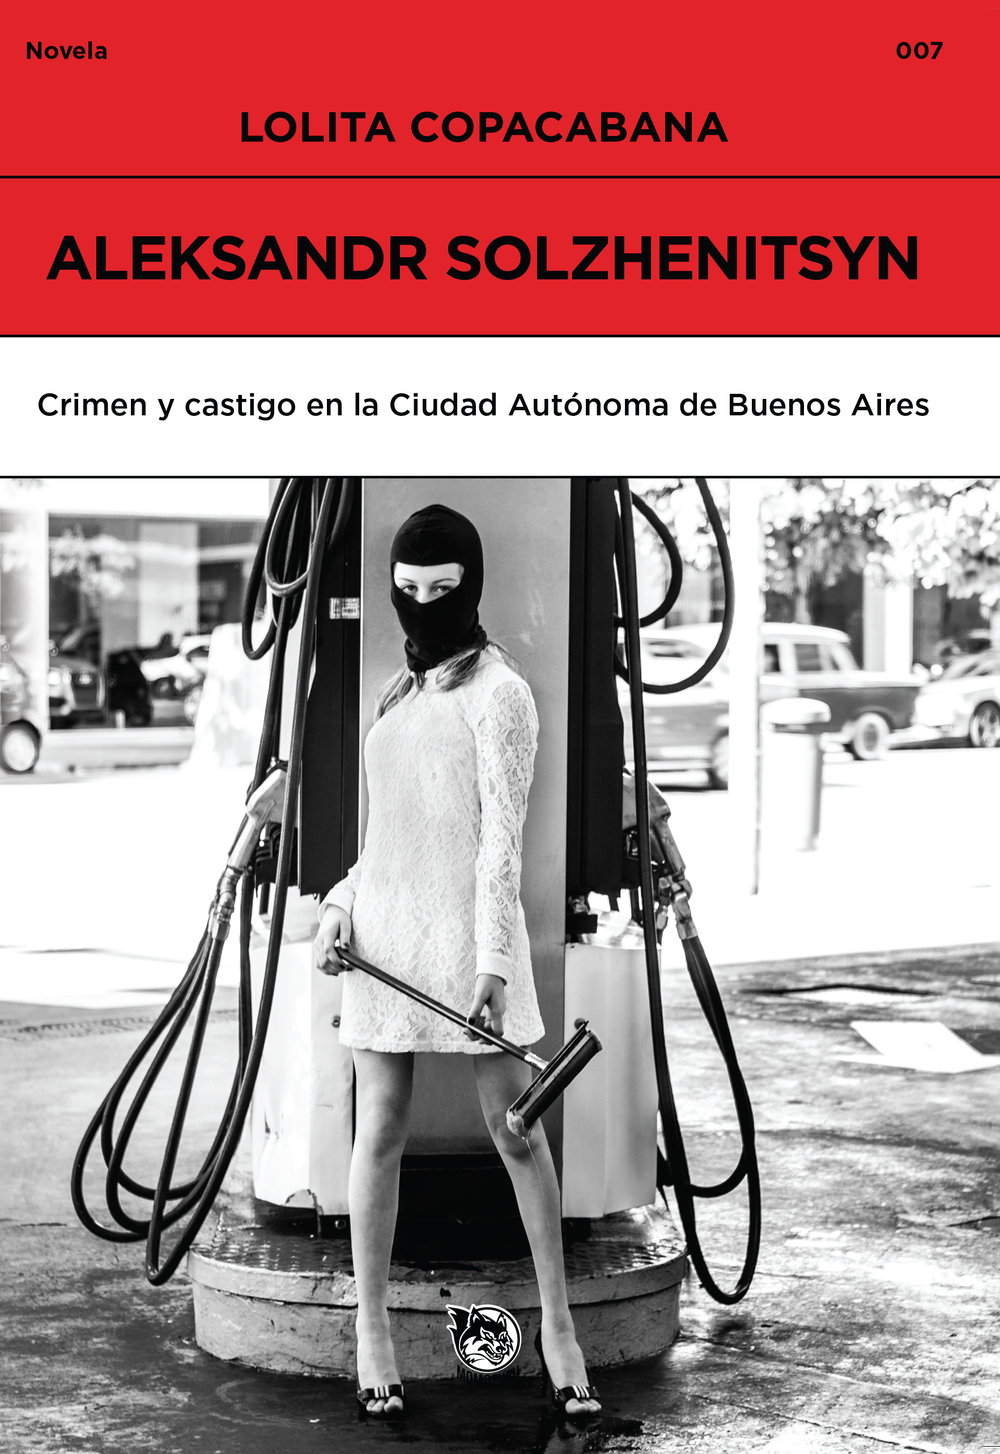 """Aleksandr Solzhenitsyn"" de Lolita Copacabana"